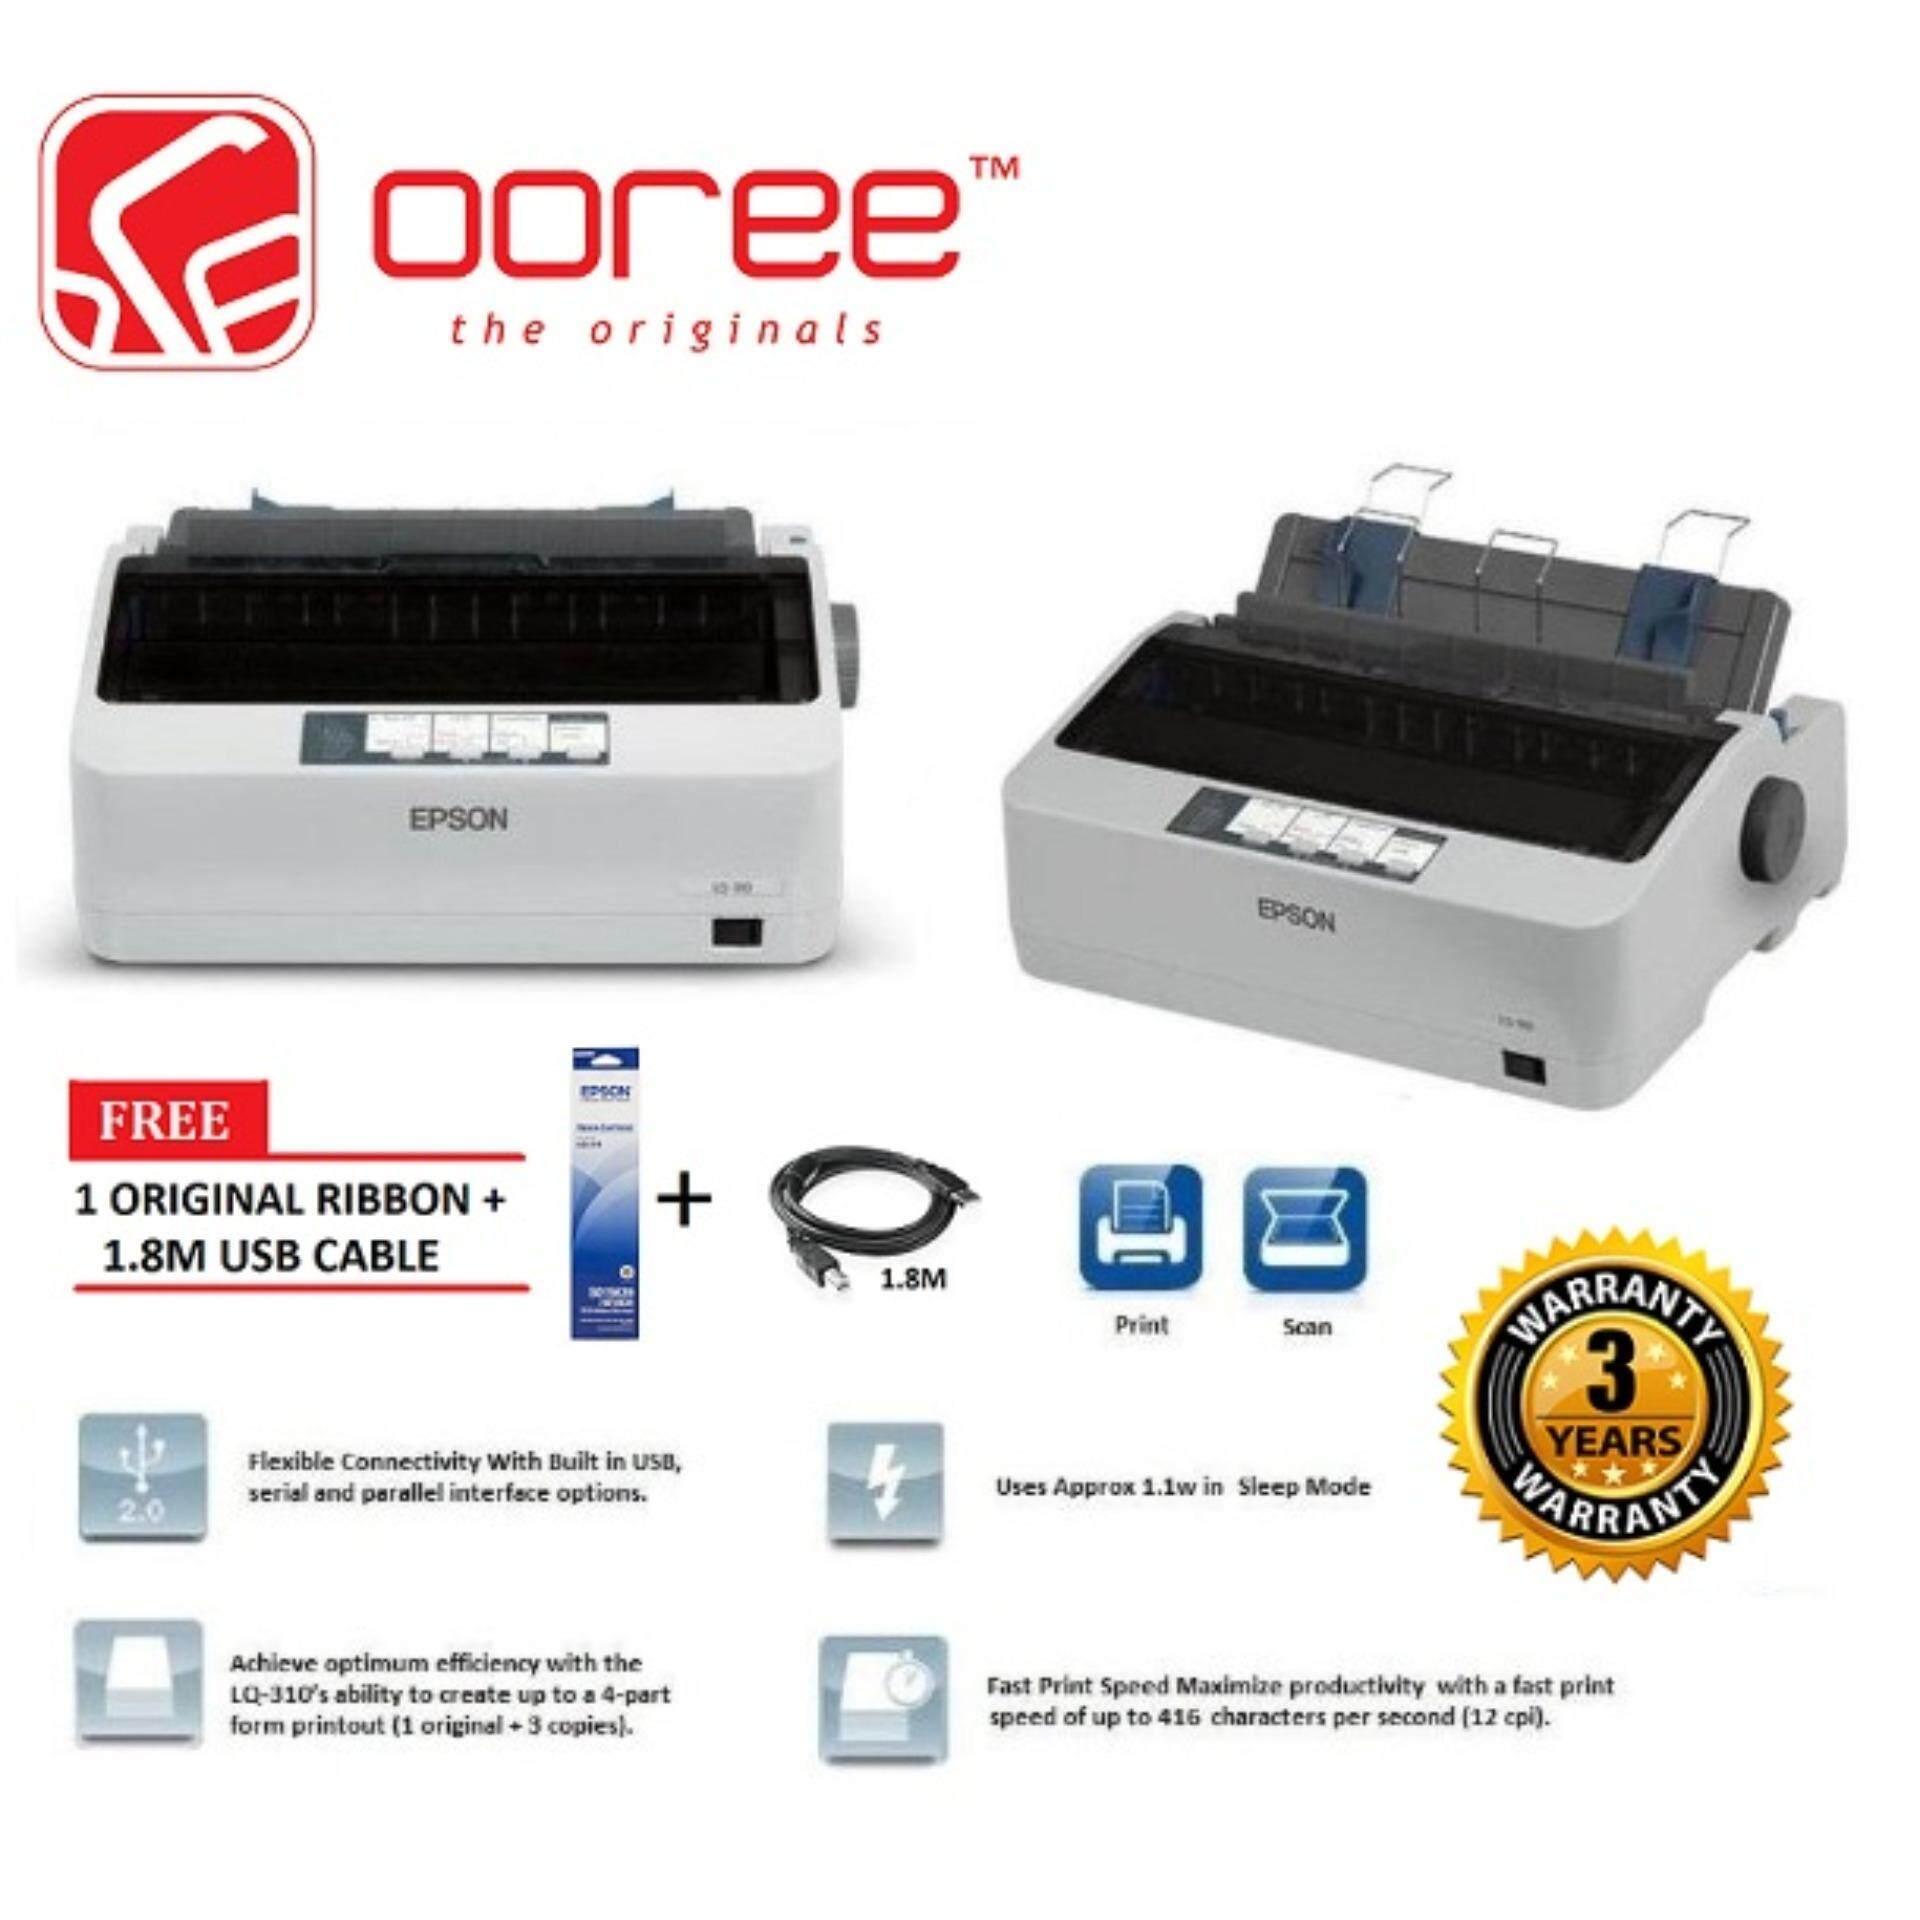 EPSON LQ310 OFFICE/HOME DOT MATRIX PRINTER LQ-310 (FREE 1PC ORIGINAL RIBBON